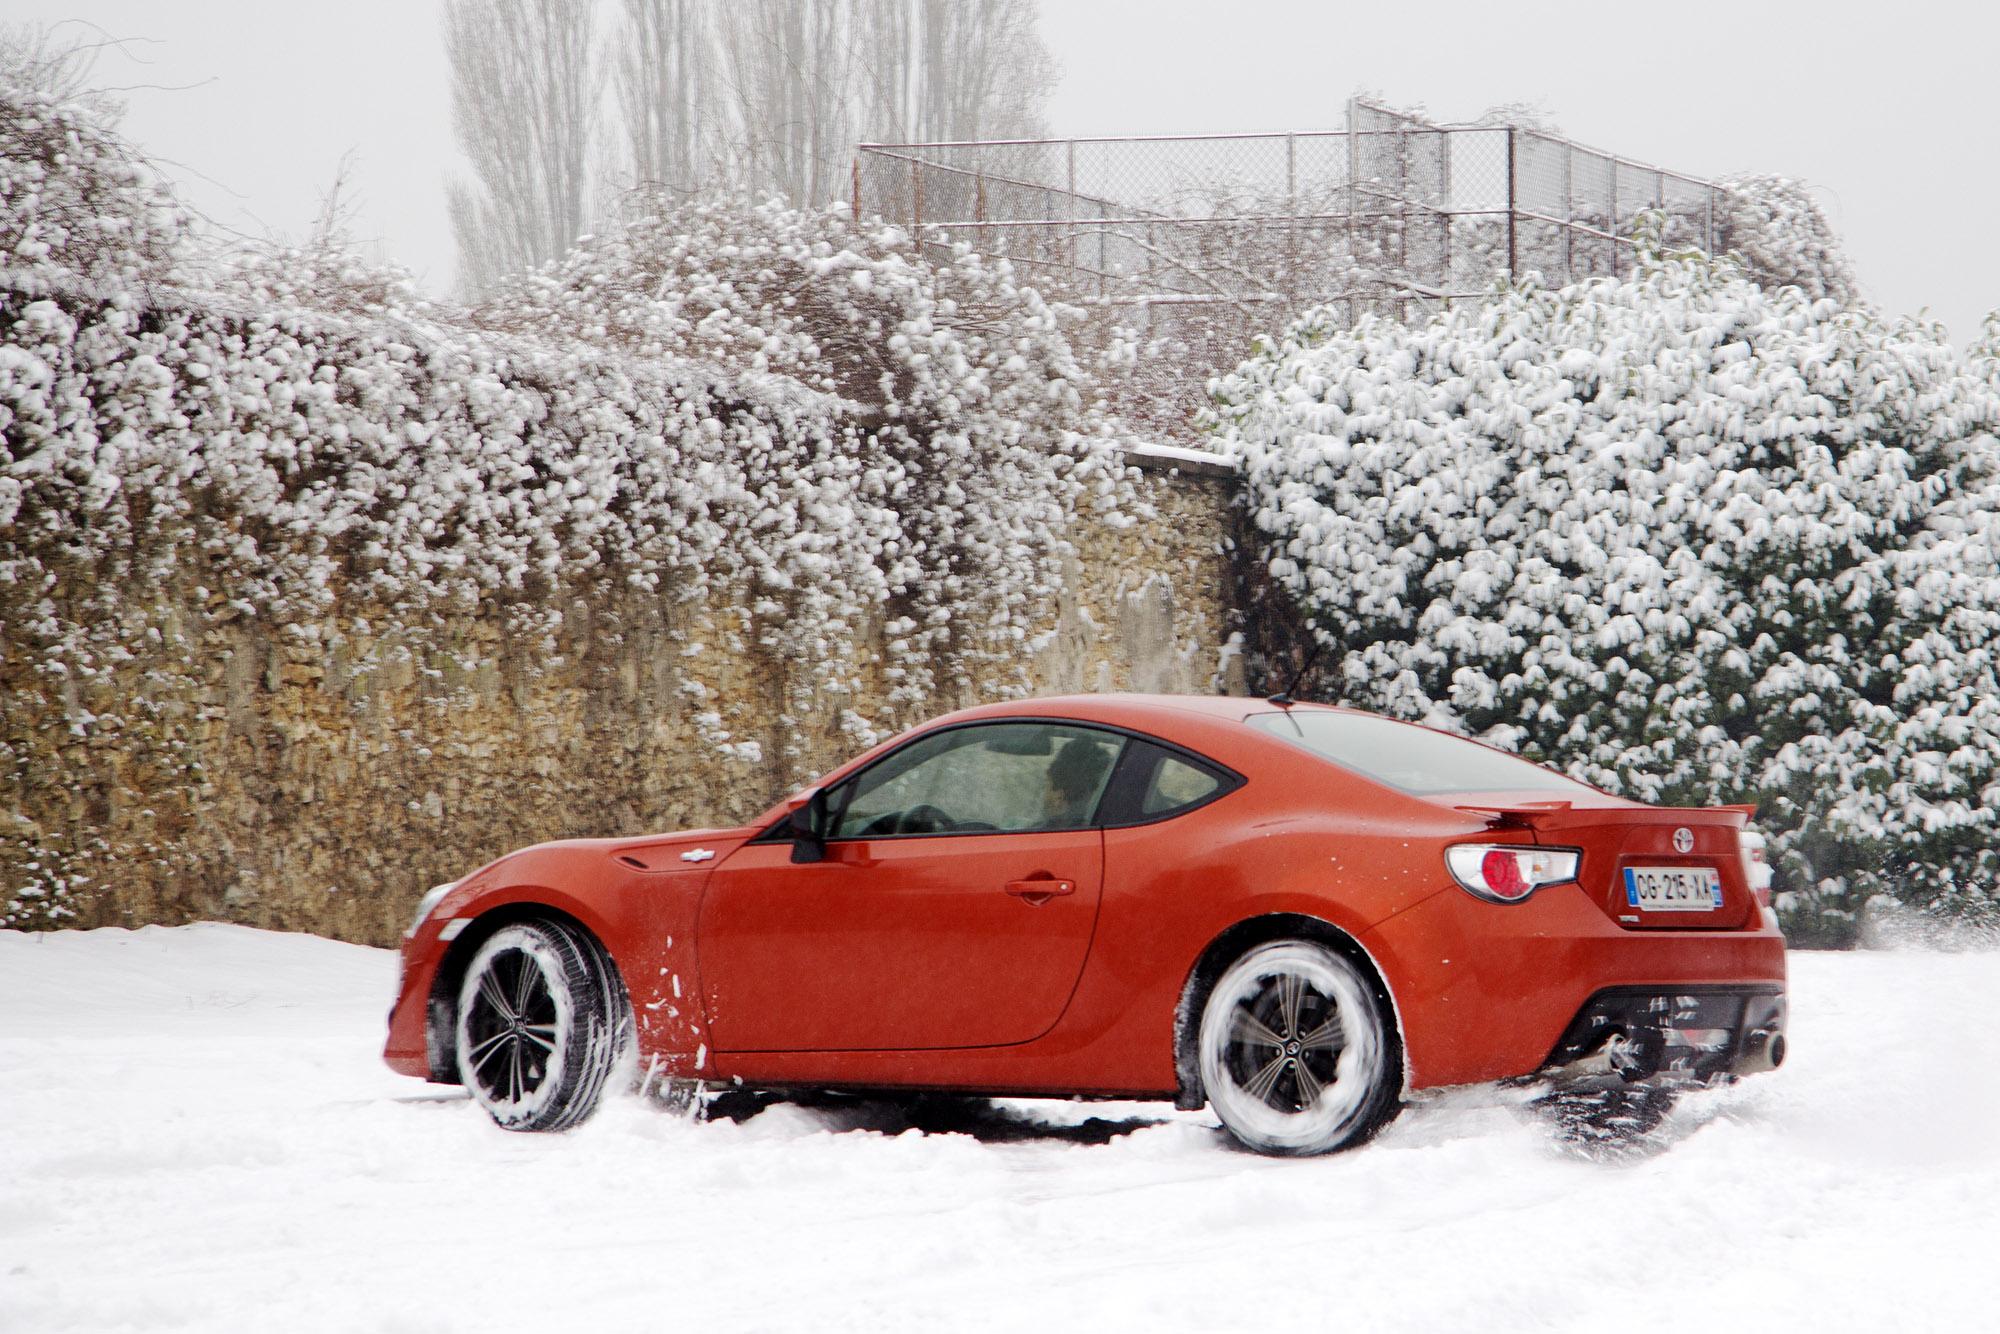 toyota gt 86 test drive snow 2 les voitures. Black Bedroom Furniture Sets. Home Design Ideas